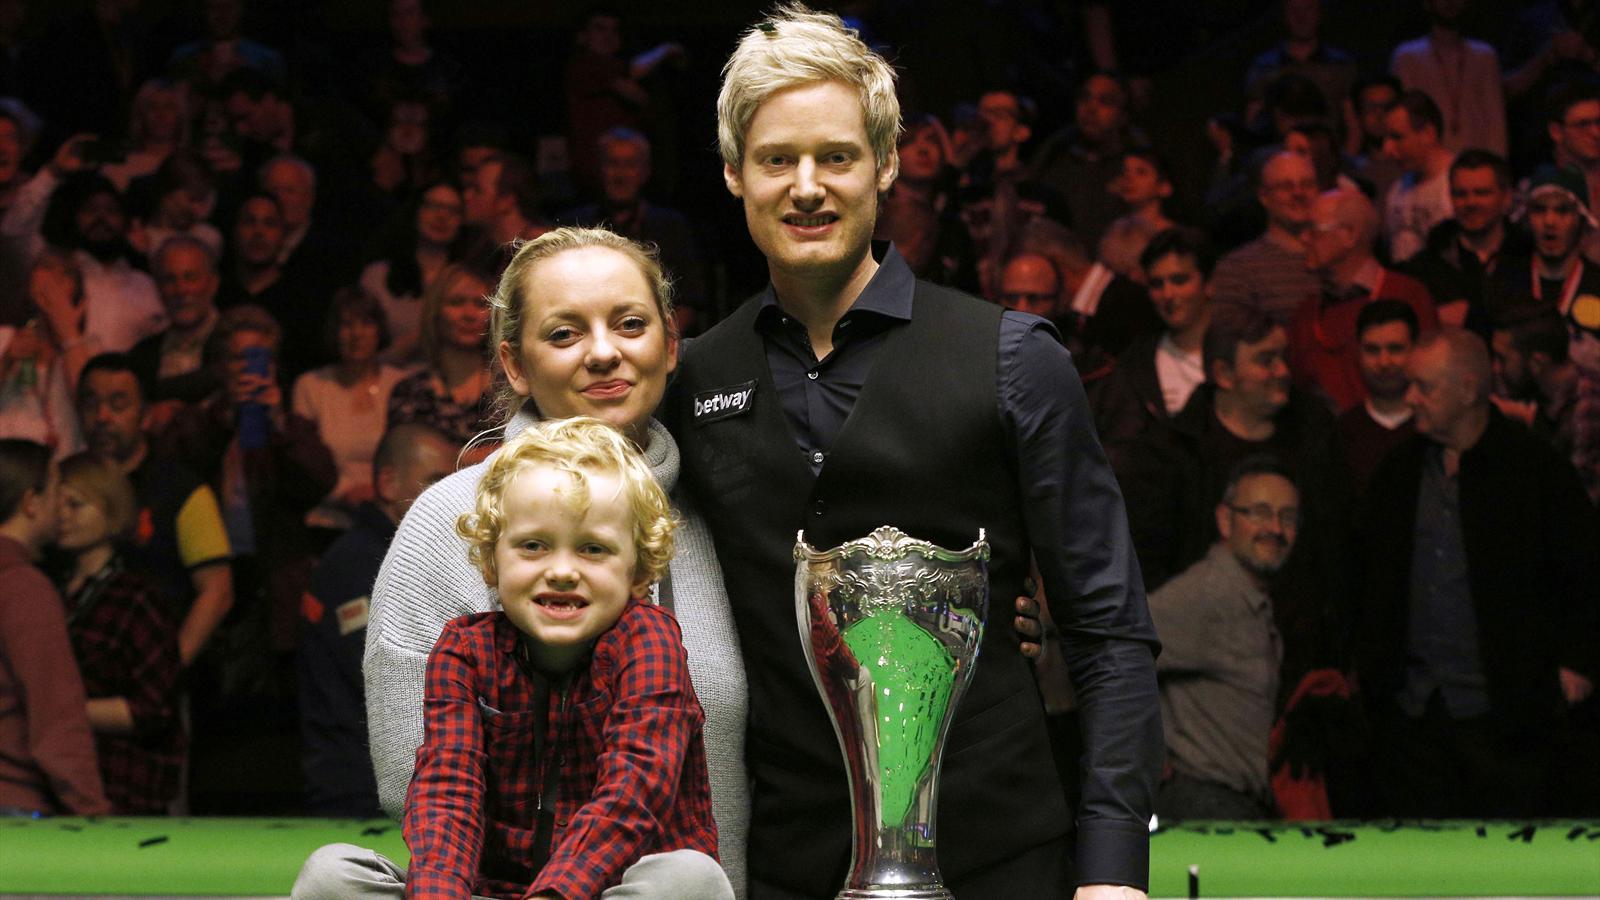 Neil Robertson wins second UK title boosted by stunning 147 break - UK Championship 2015-2016 ...